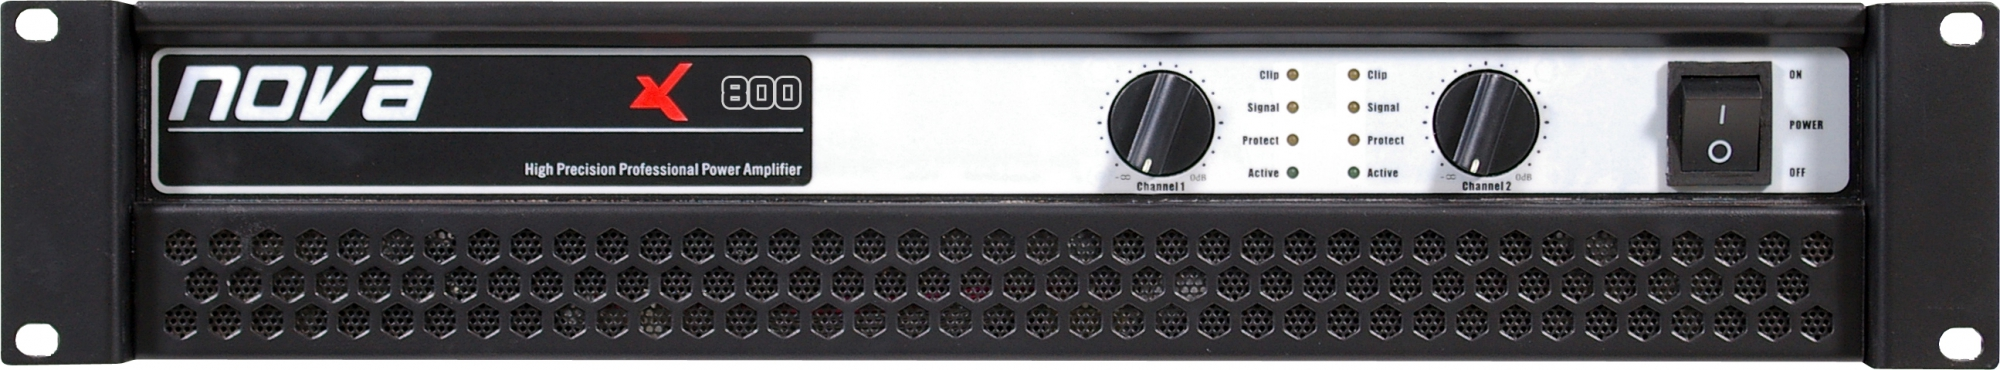 NOVA X 800